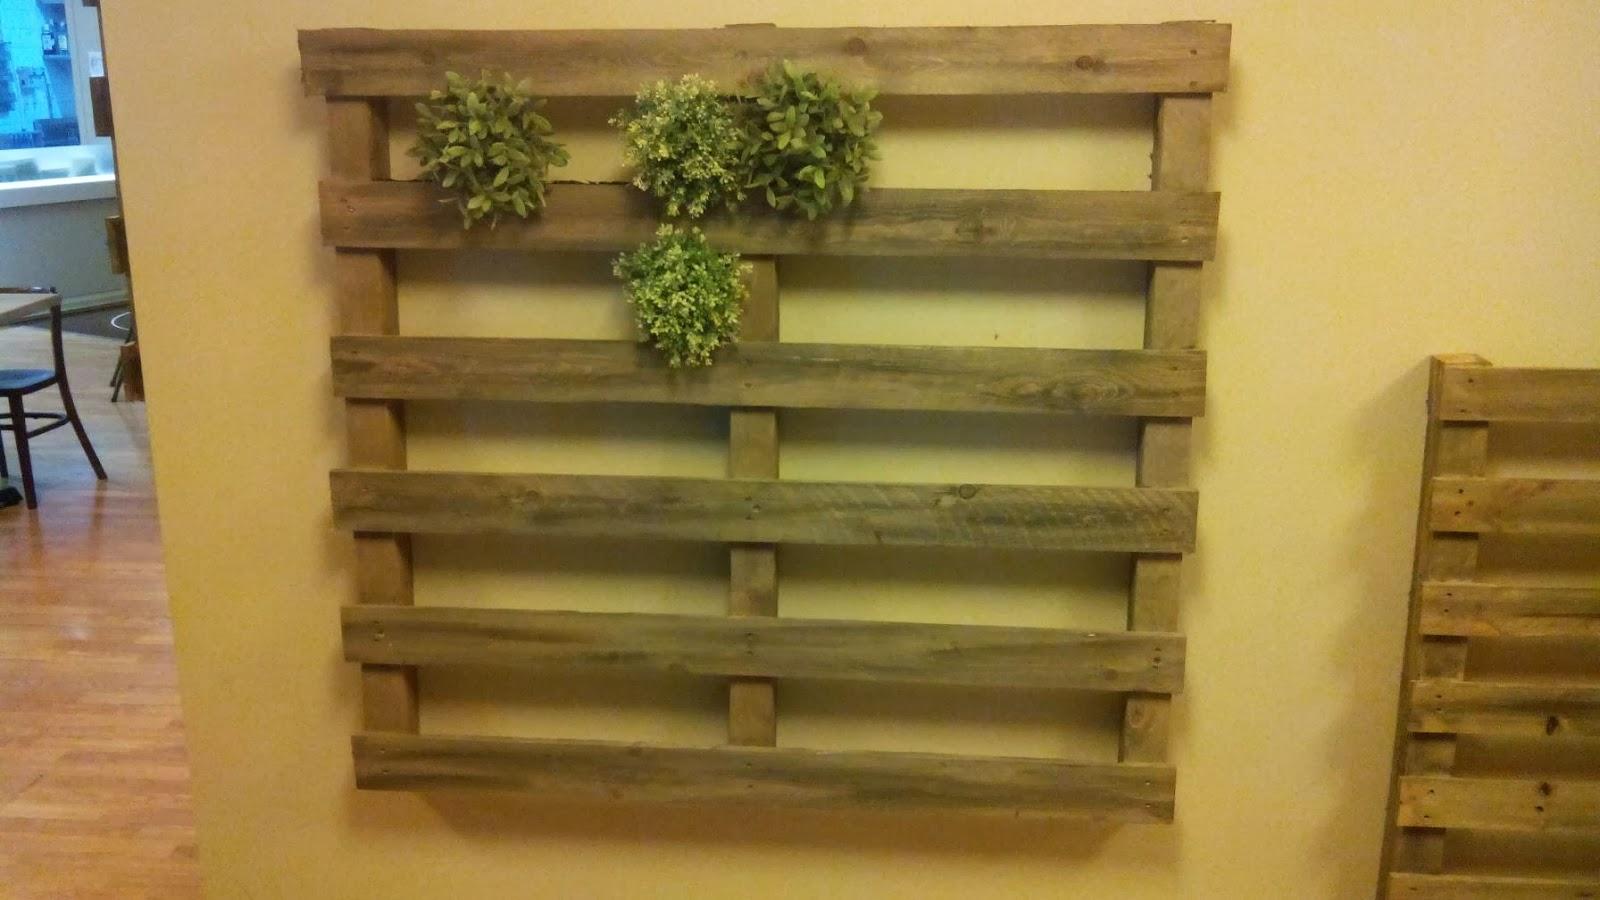 Jard n vertical hecho con palets for Jardin vertical en palets